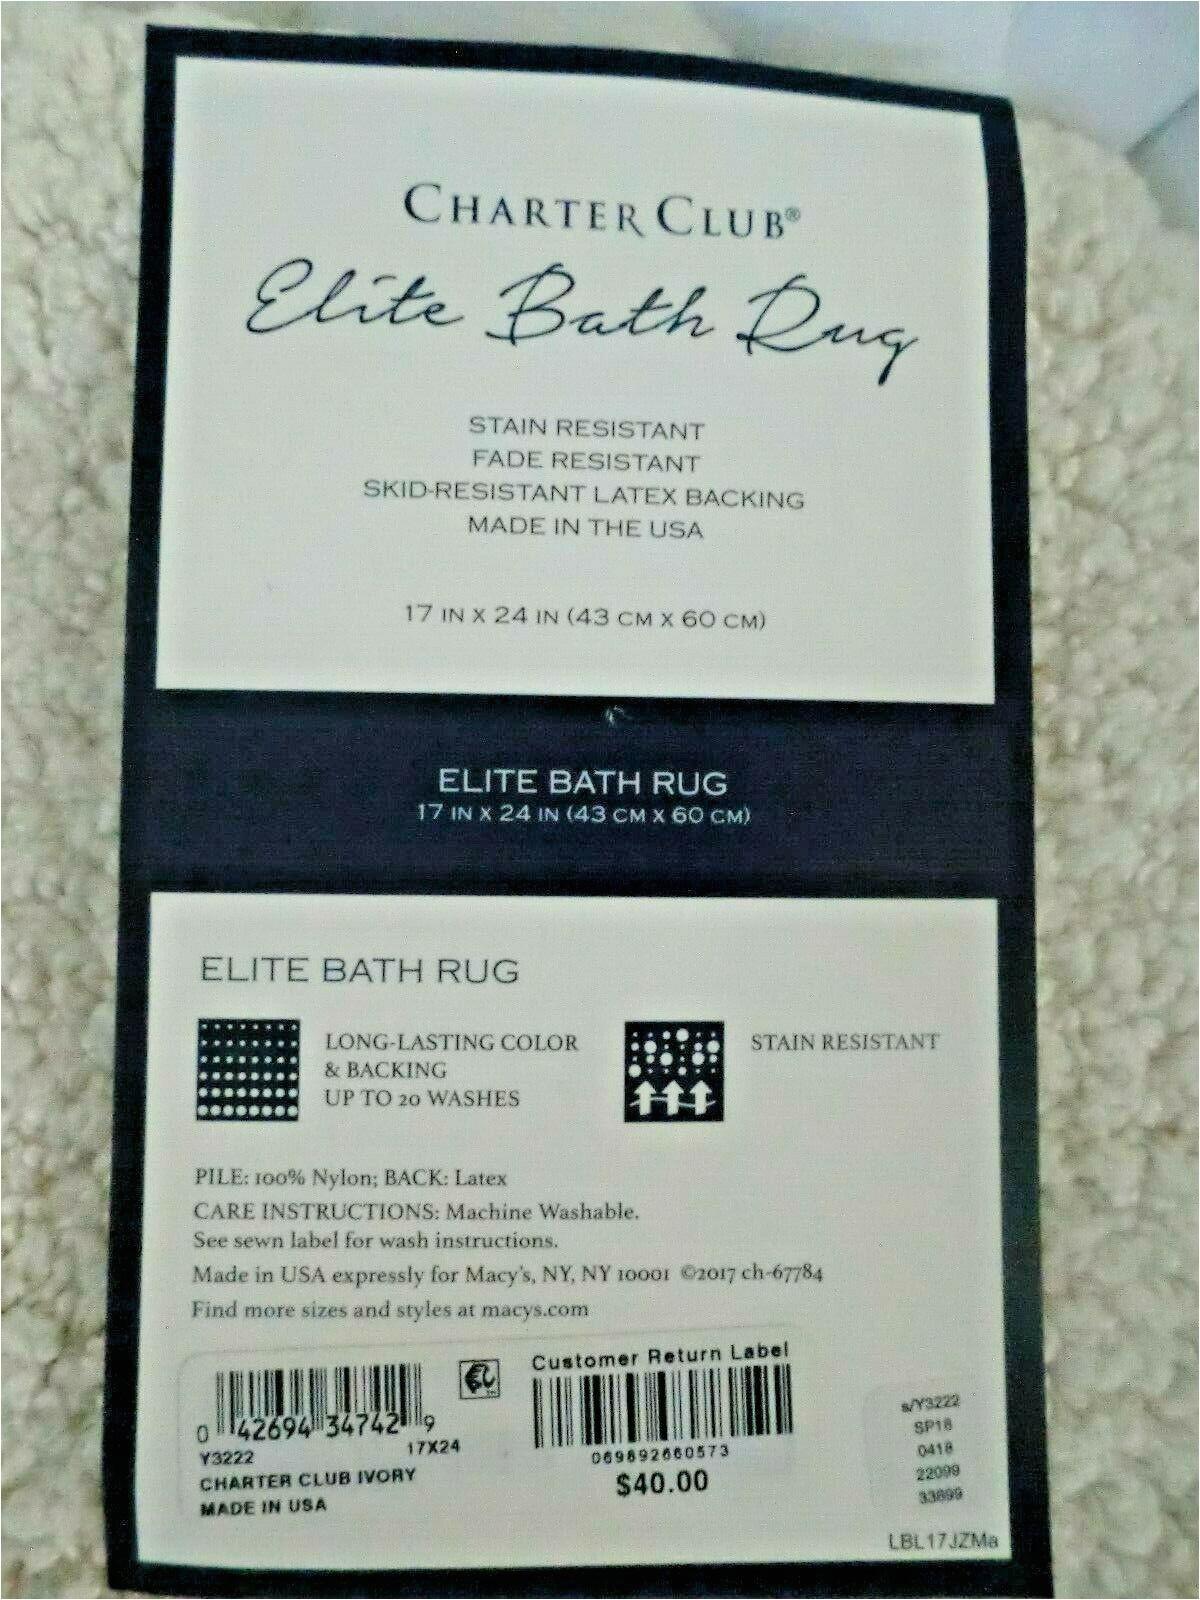 Charter Club Bath Rugs Charter Club Elite Bath Rug 17 X 24in 43×60 Cm Skid Resistant Made In Usa Nwt